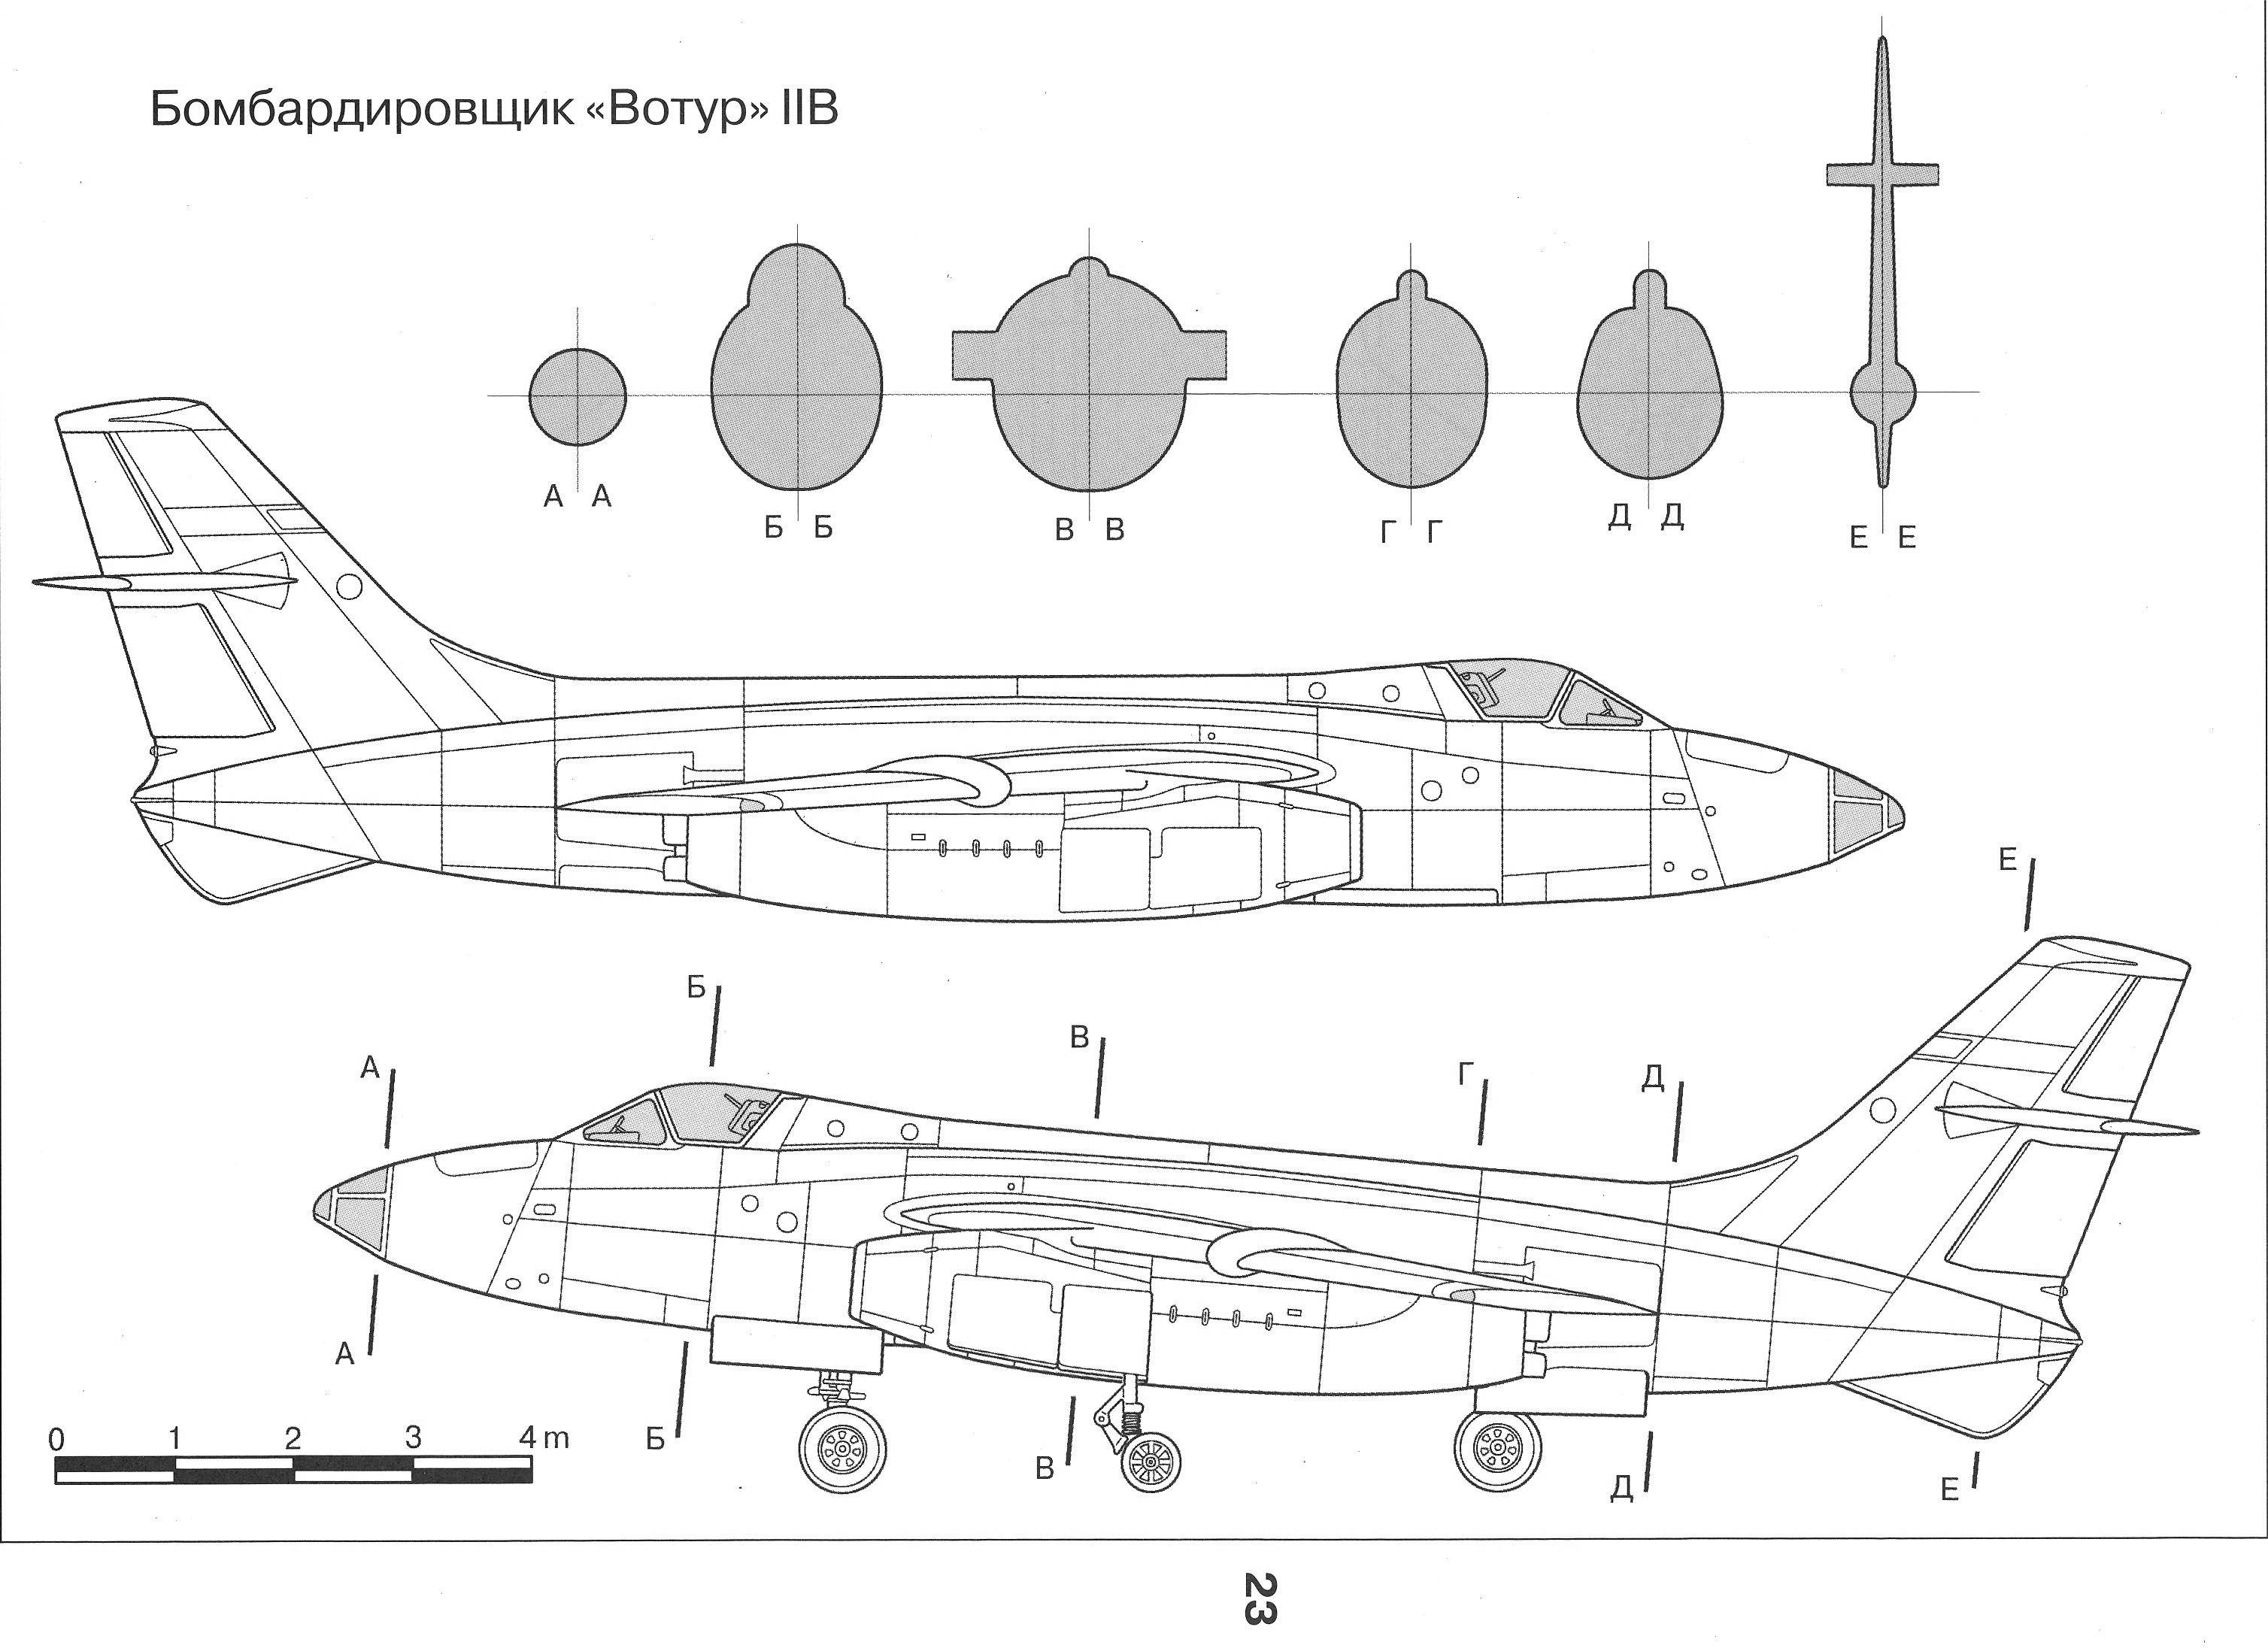 Vautour blueprint